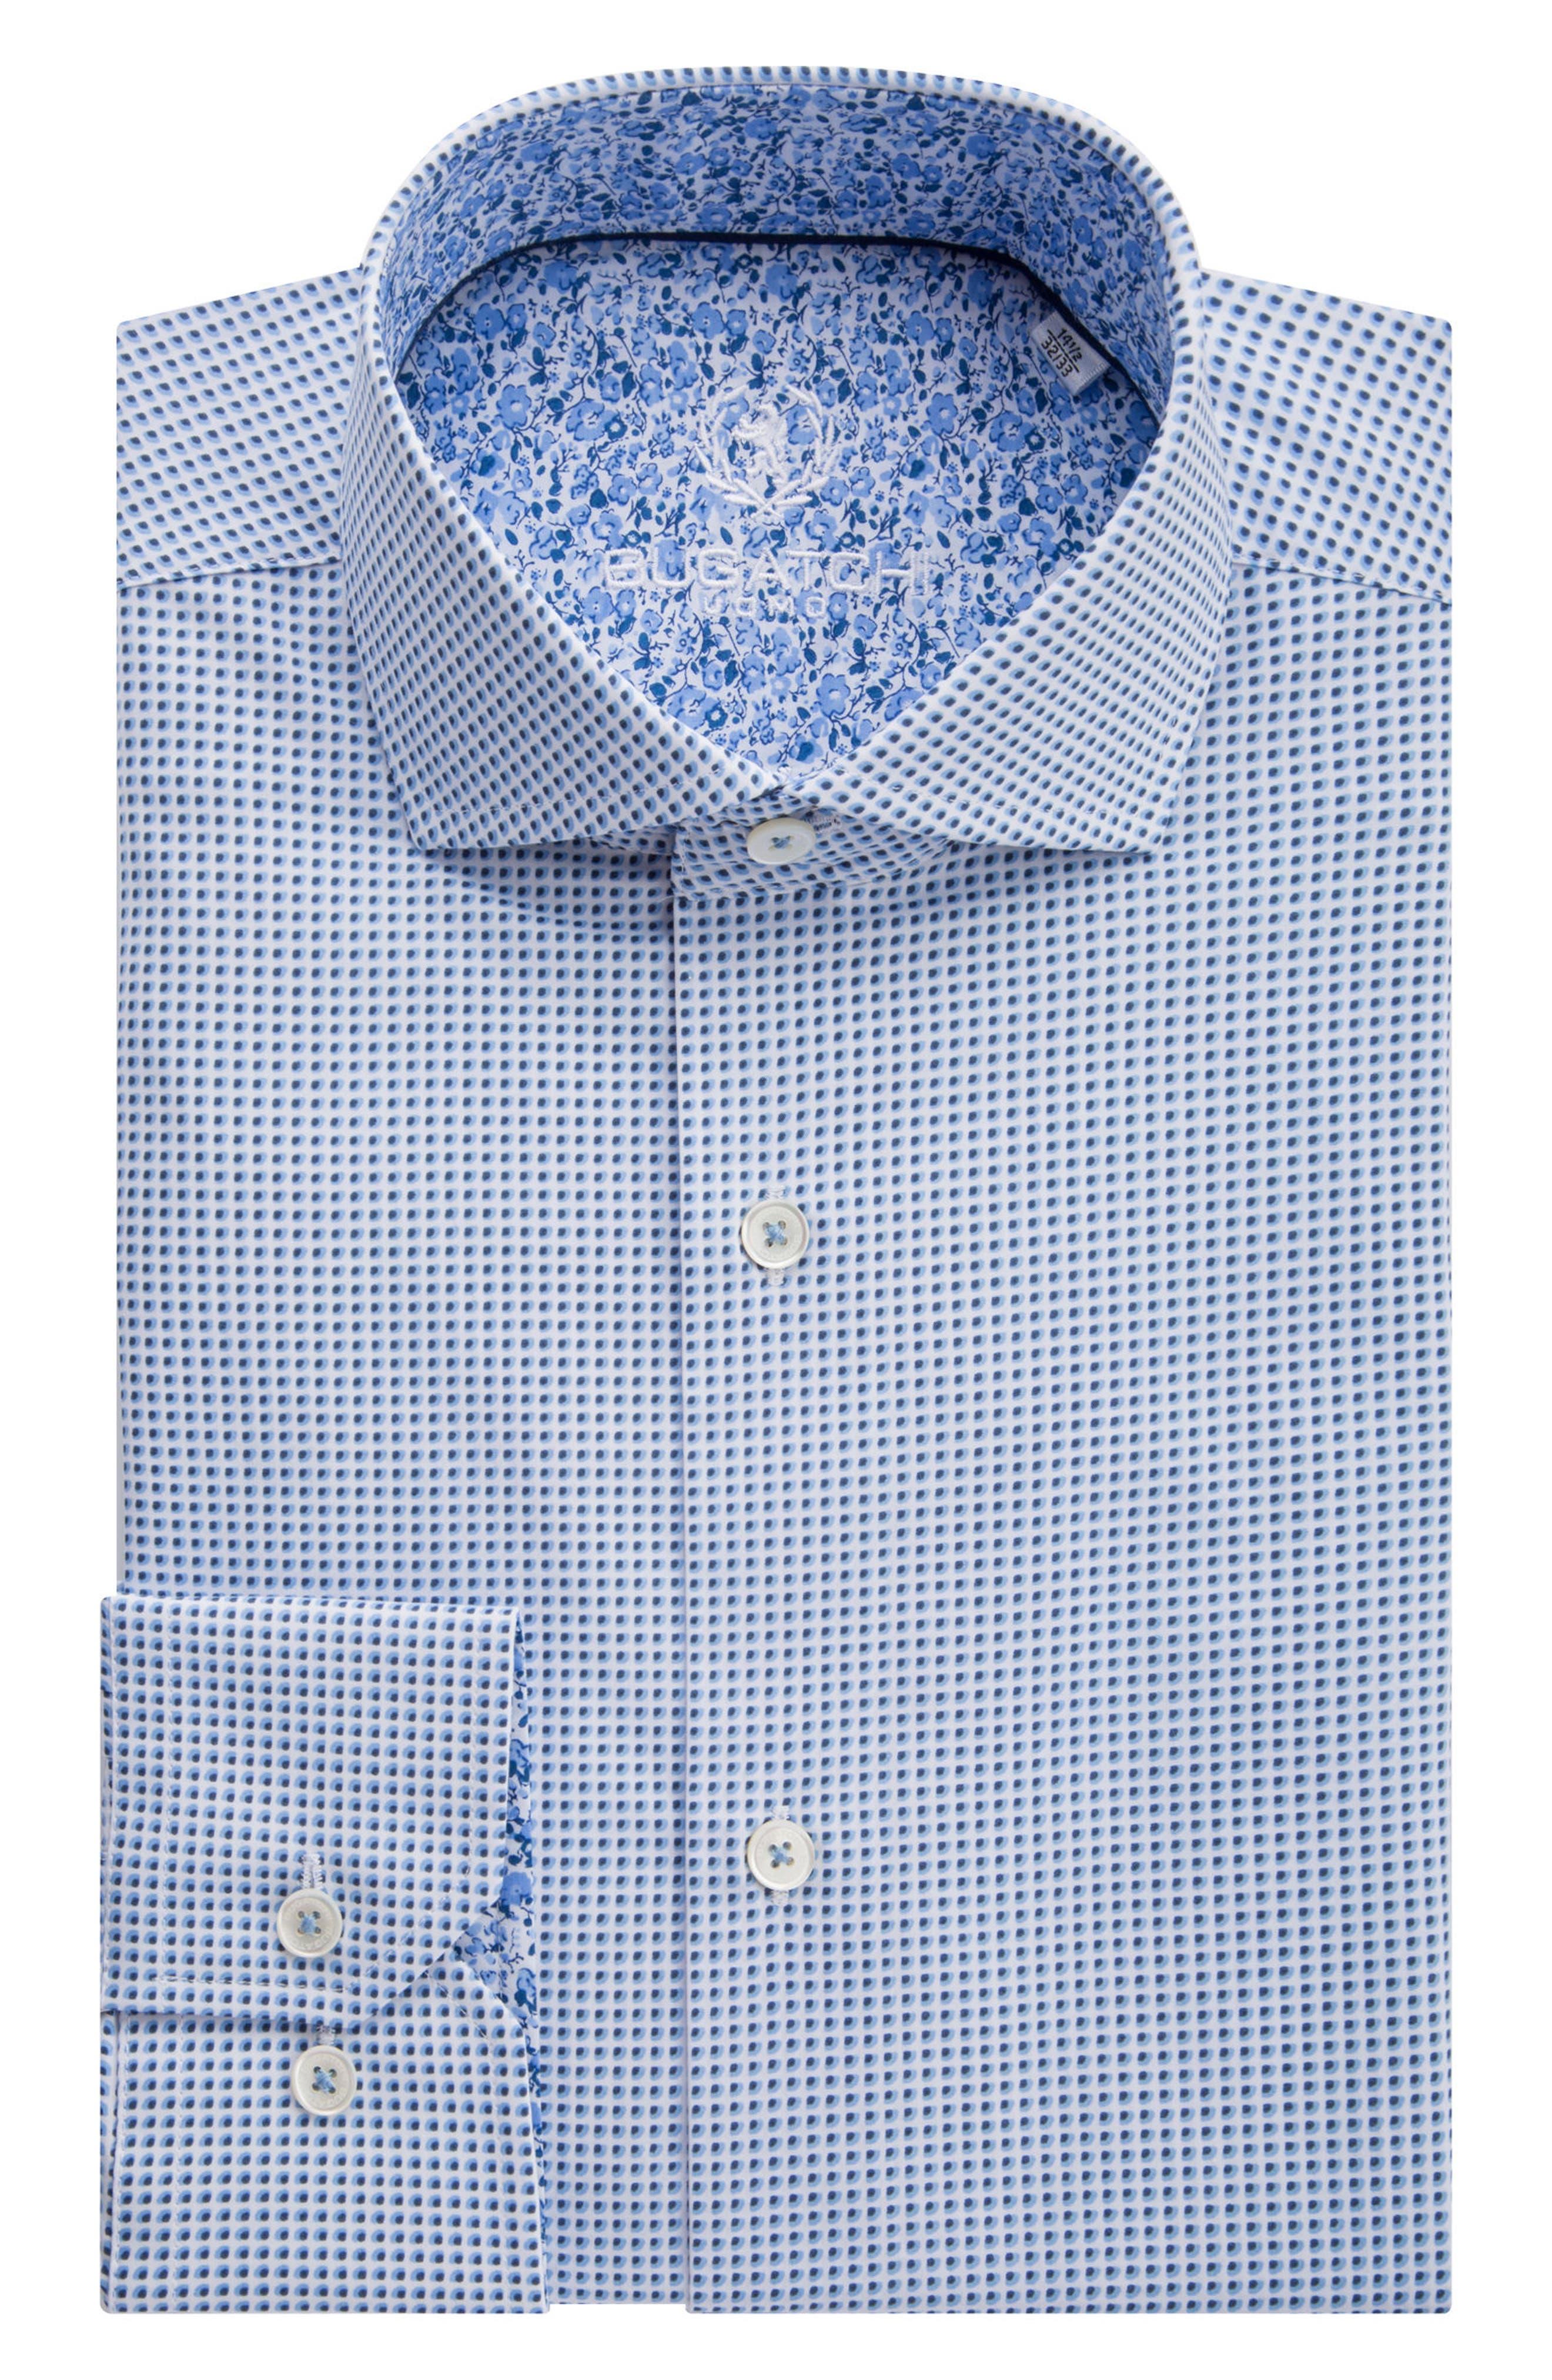 Main Image - Bugatchi Trim Fit Geometric Dress Shirt